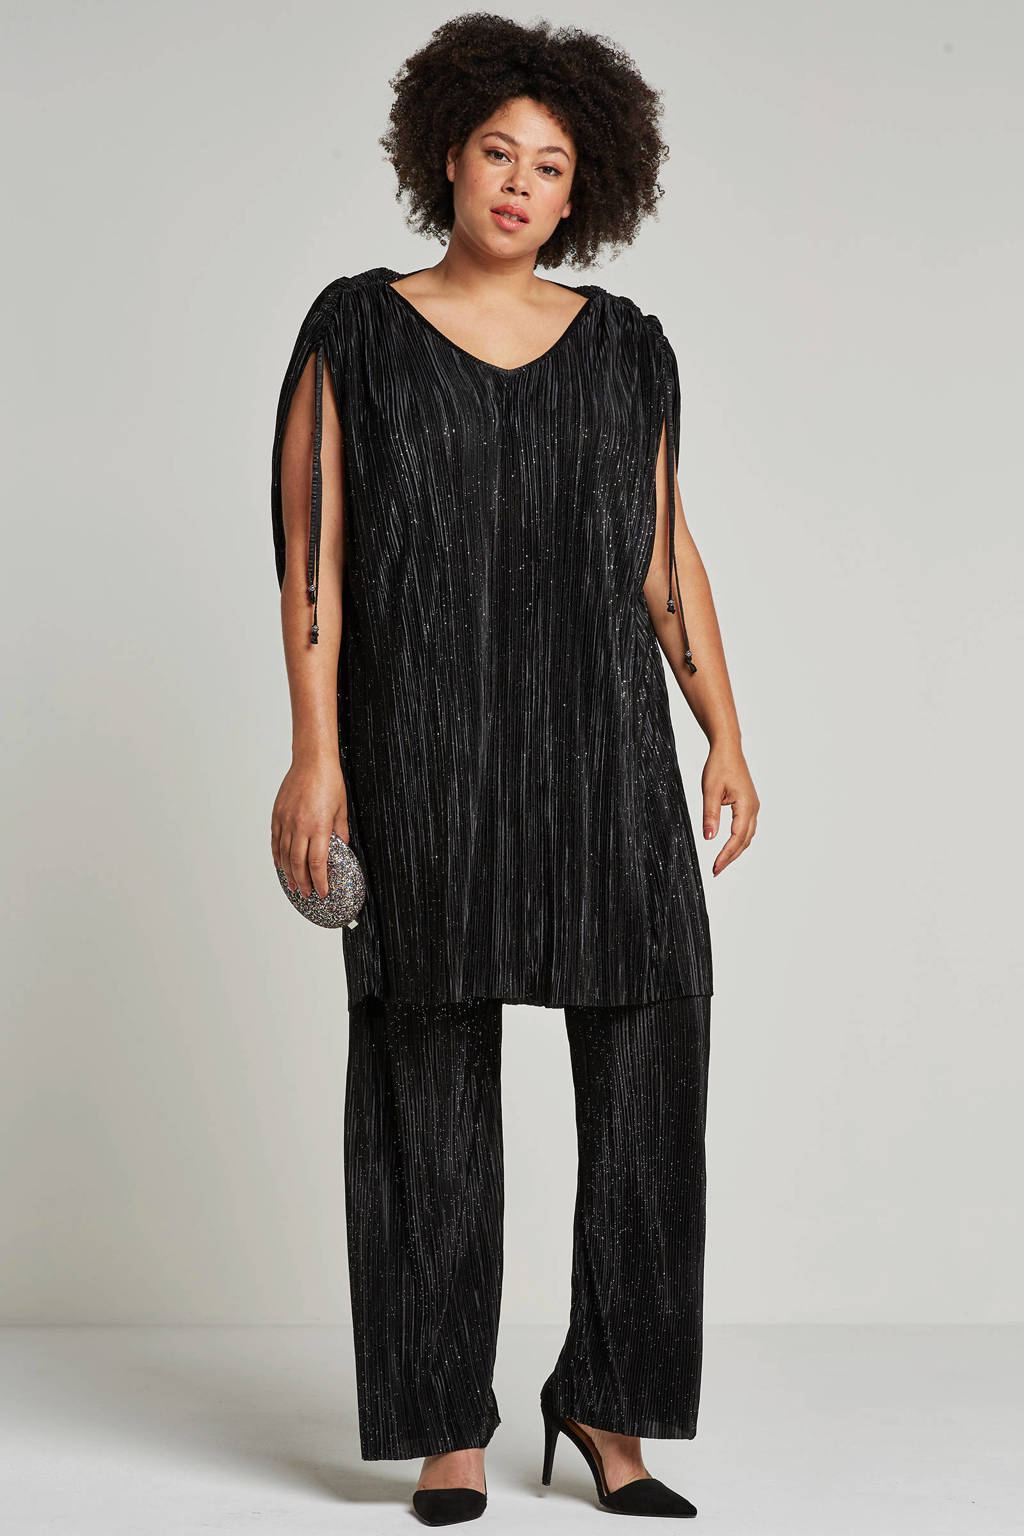 Zhenzi broek met glitter, Zwart/glitter